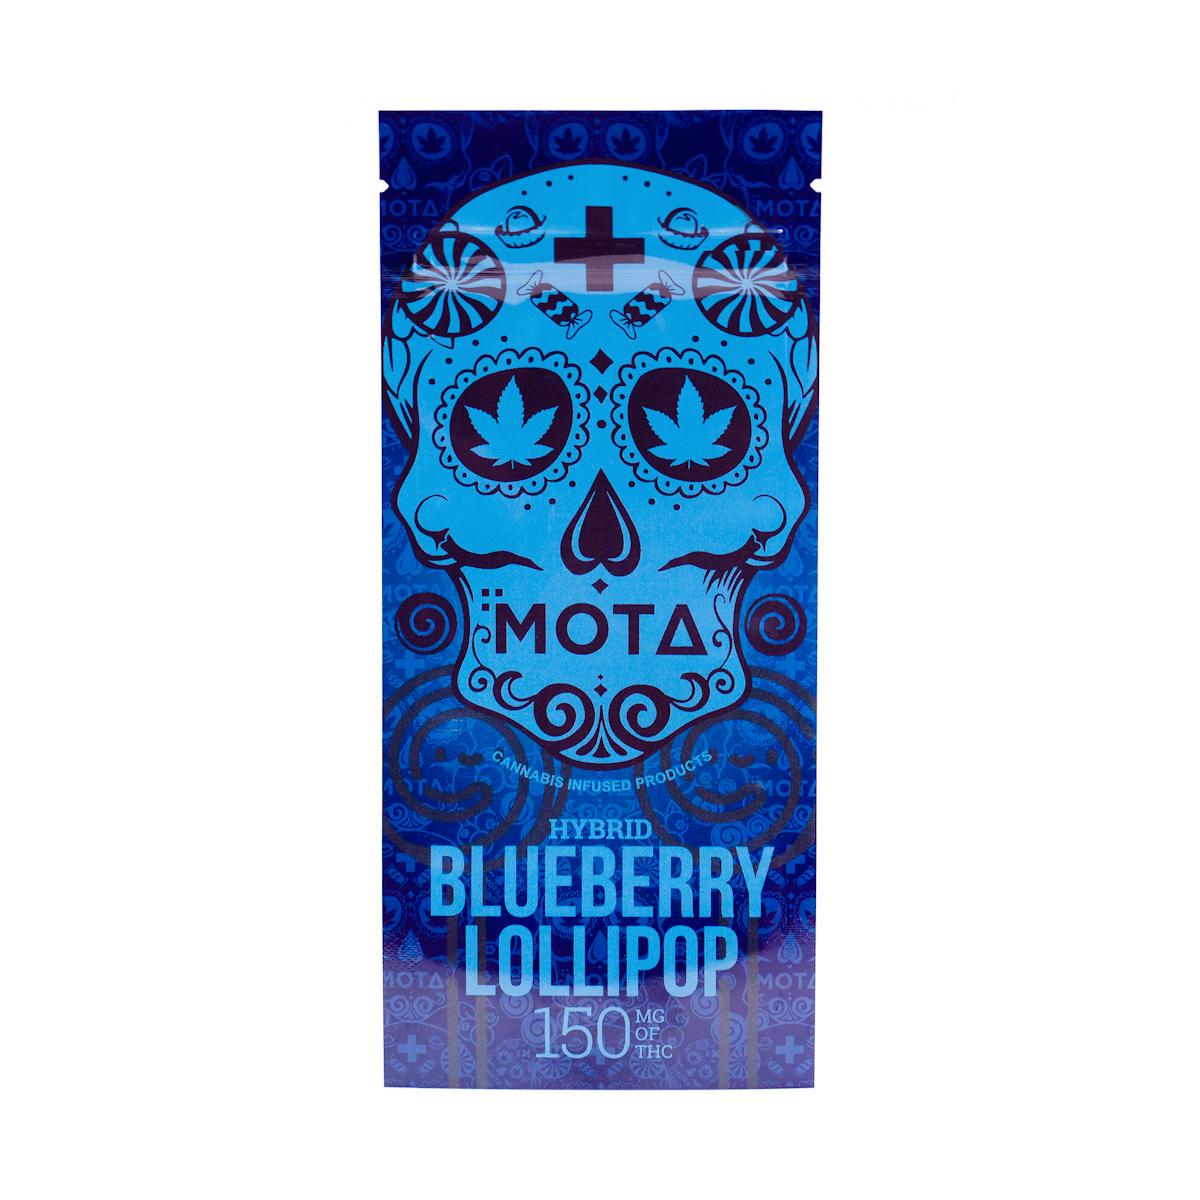 BUy MOTA Lollipop - Blueberry